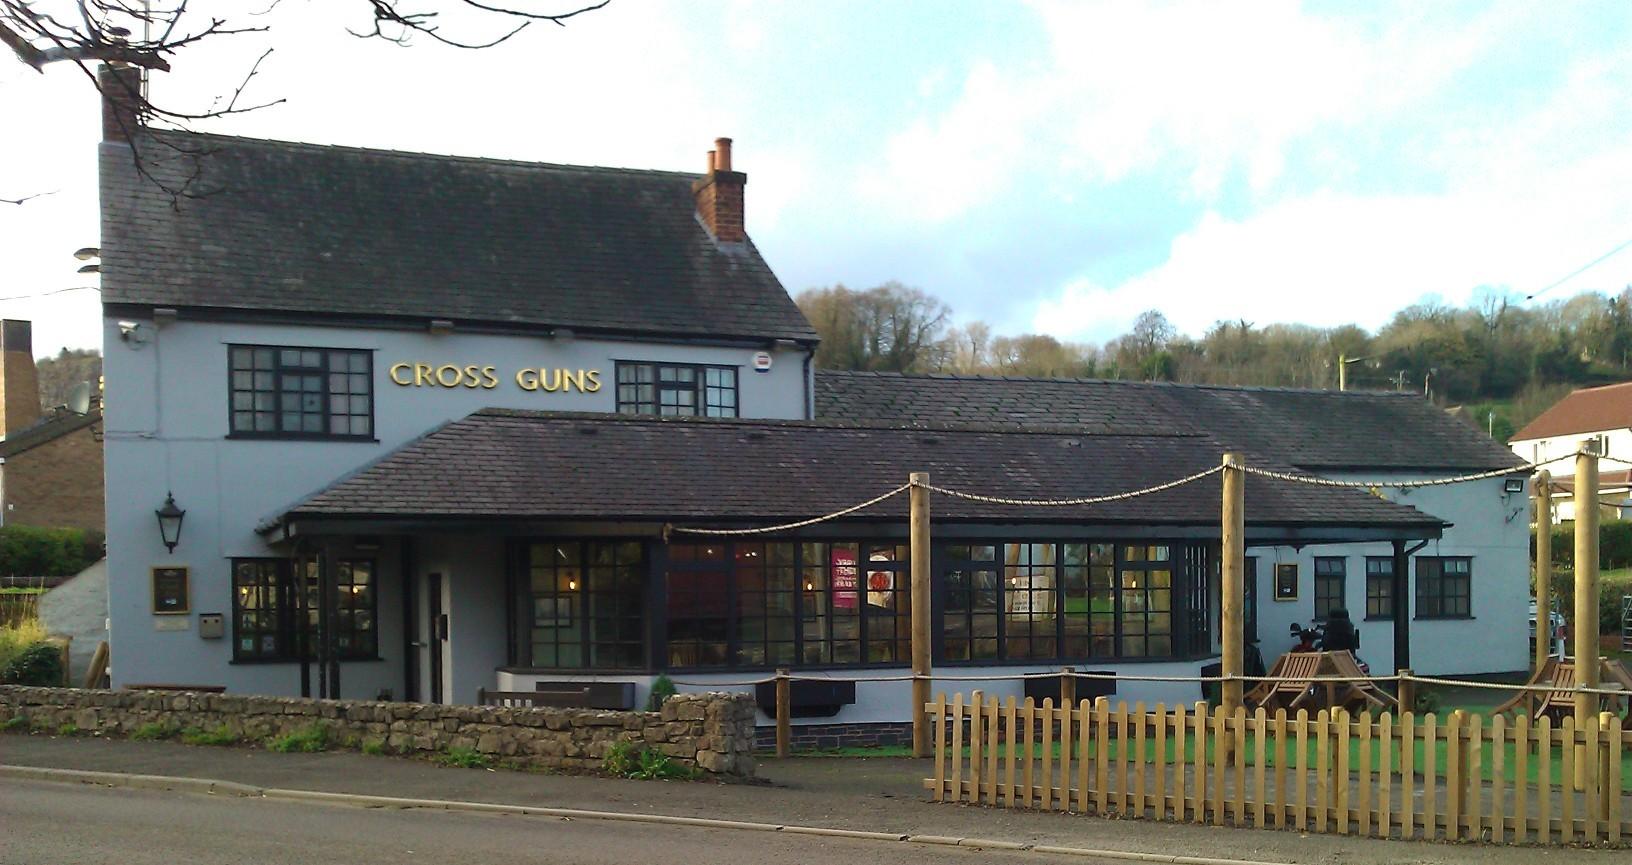 Cross Guns Inn, Pant, Shropshire